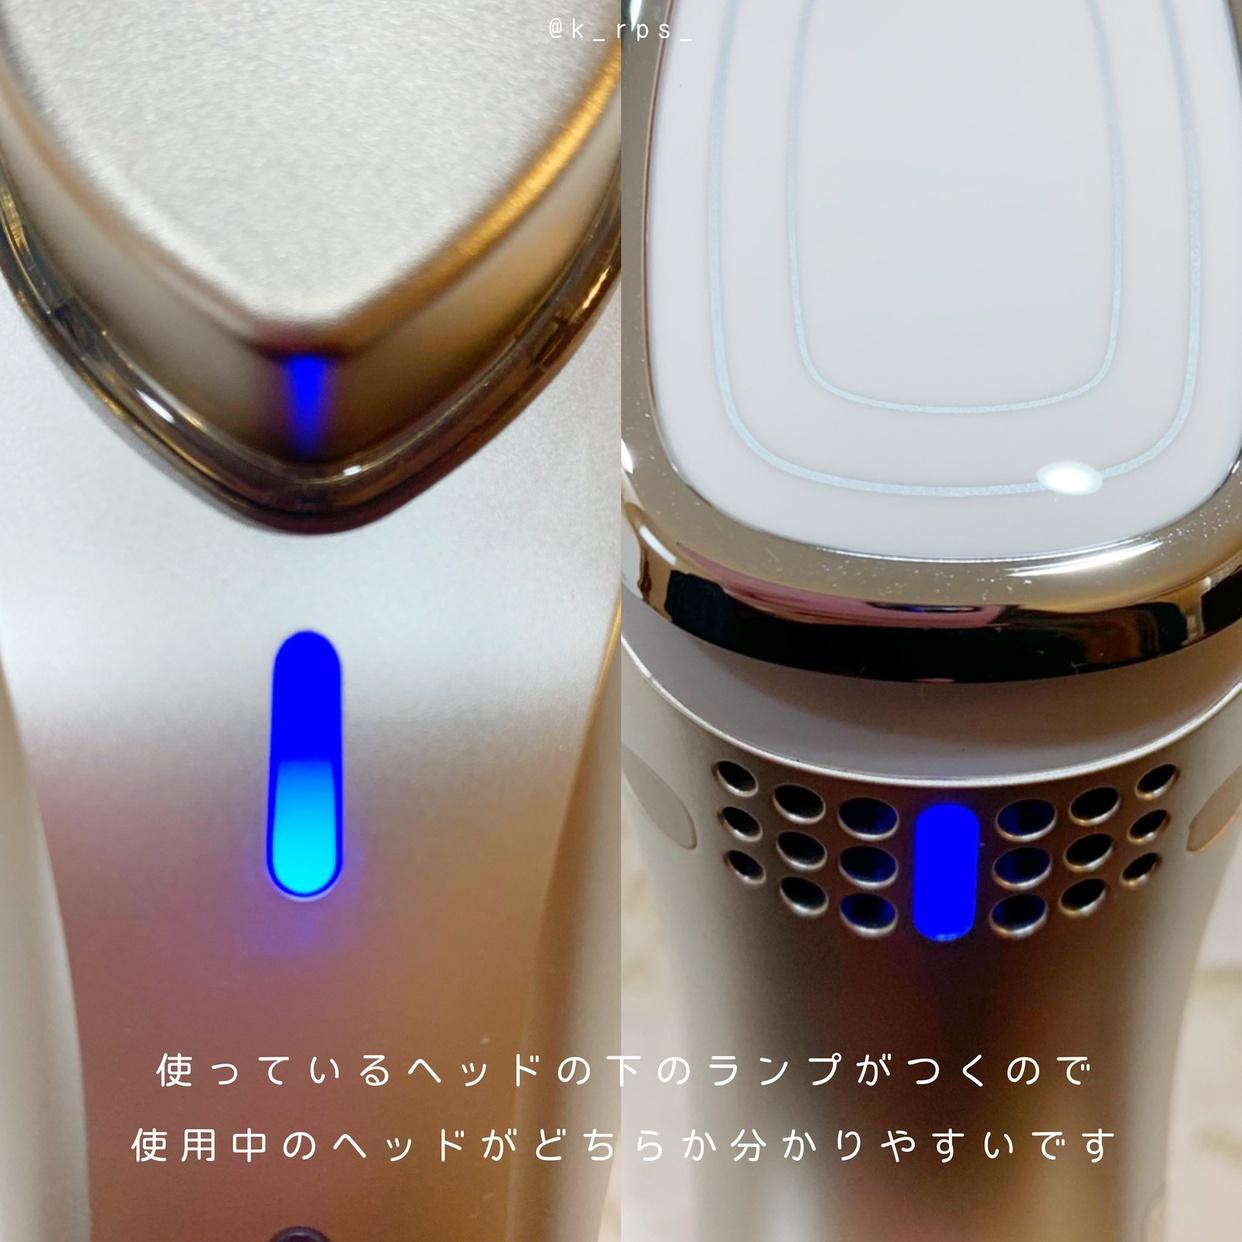 Panasonic(パナソニック) イオンエフェクター EH-ST98-Nを使ったKeiさんのクチコミ画像3